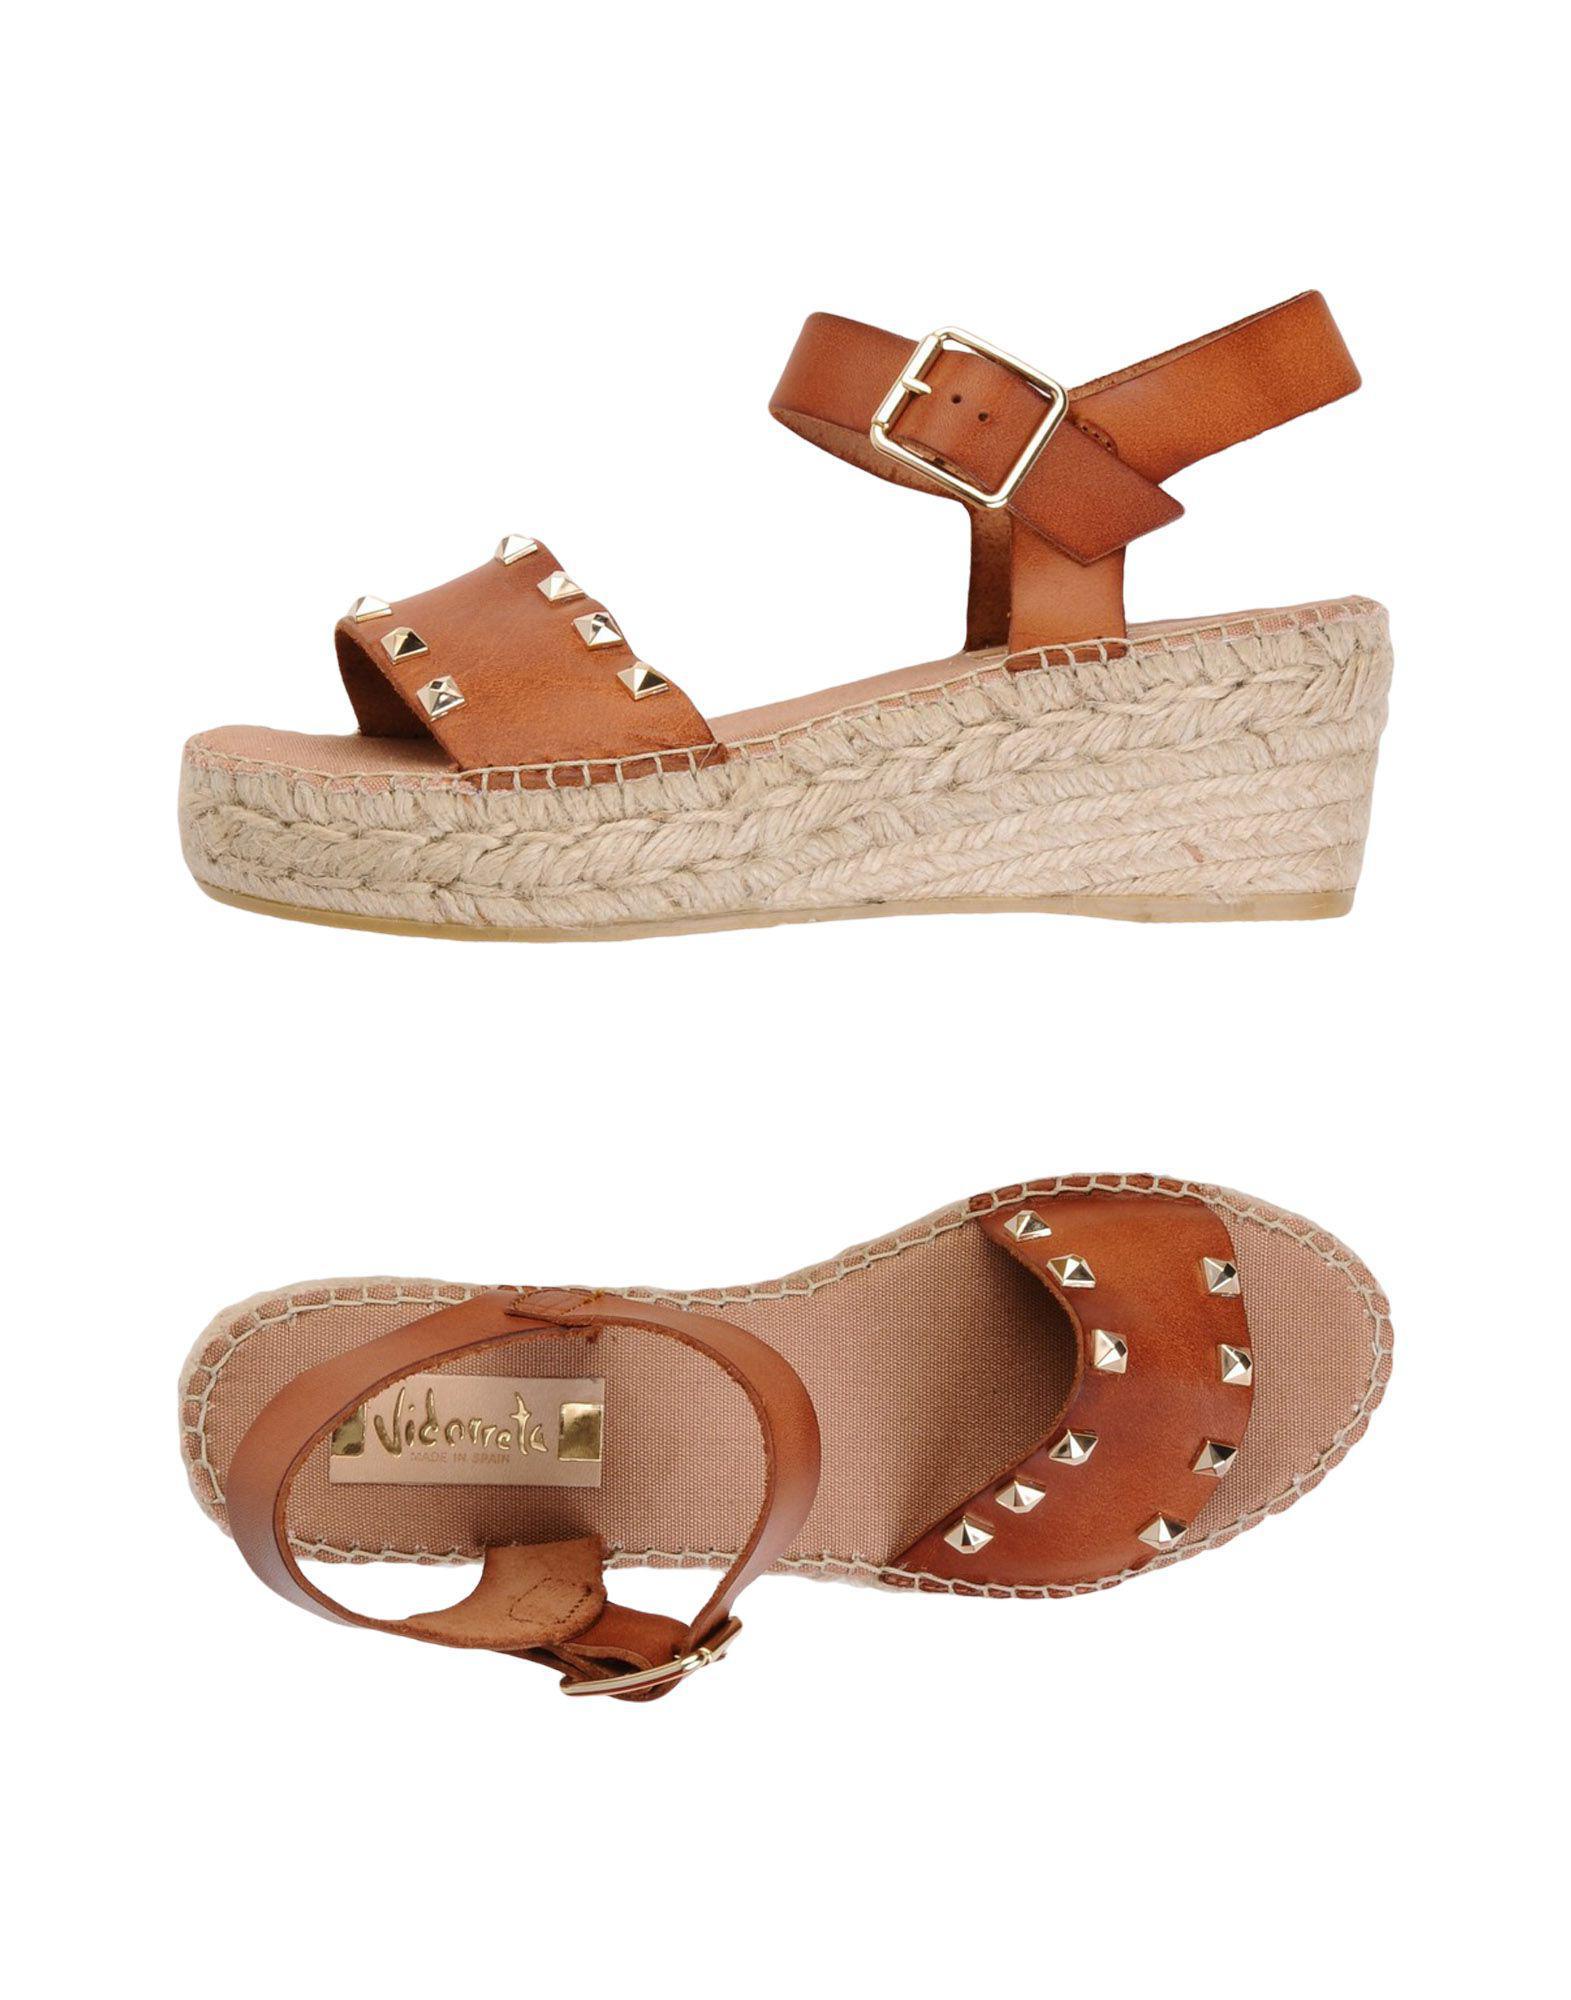 67f1412afba Lyst - Vidorreta Sandals in Brown